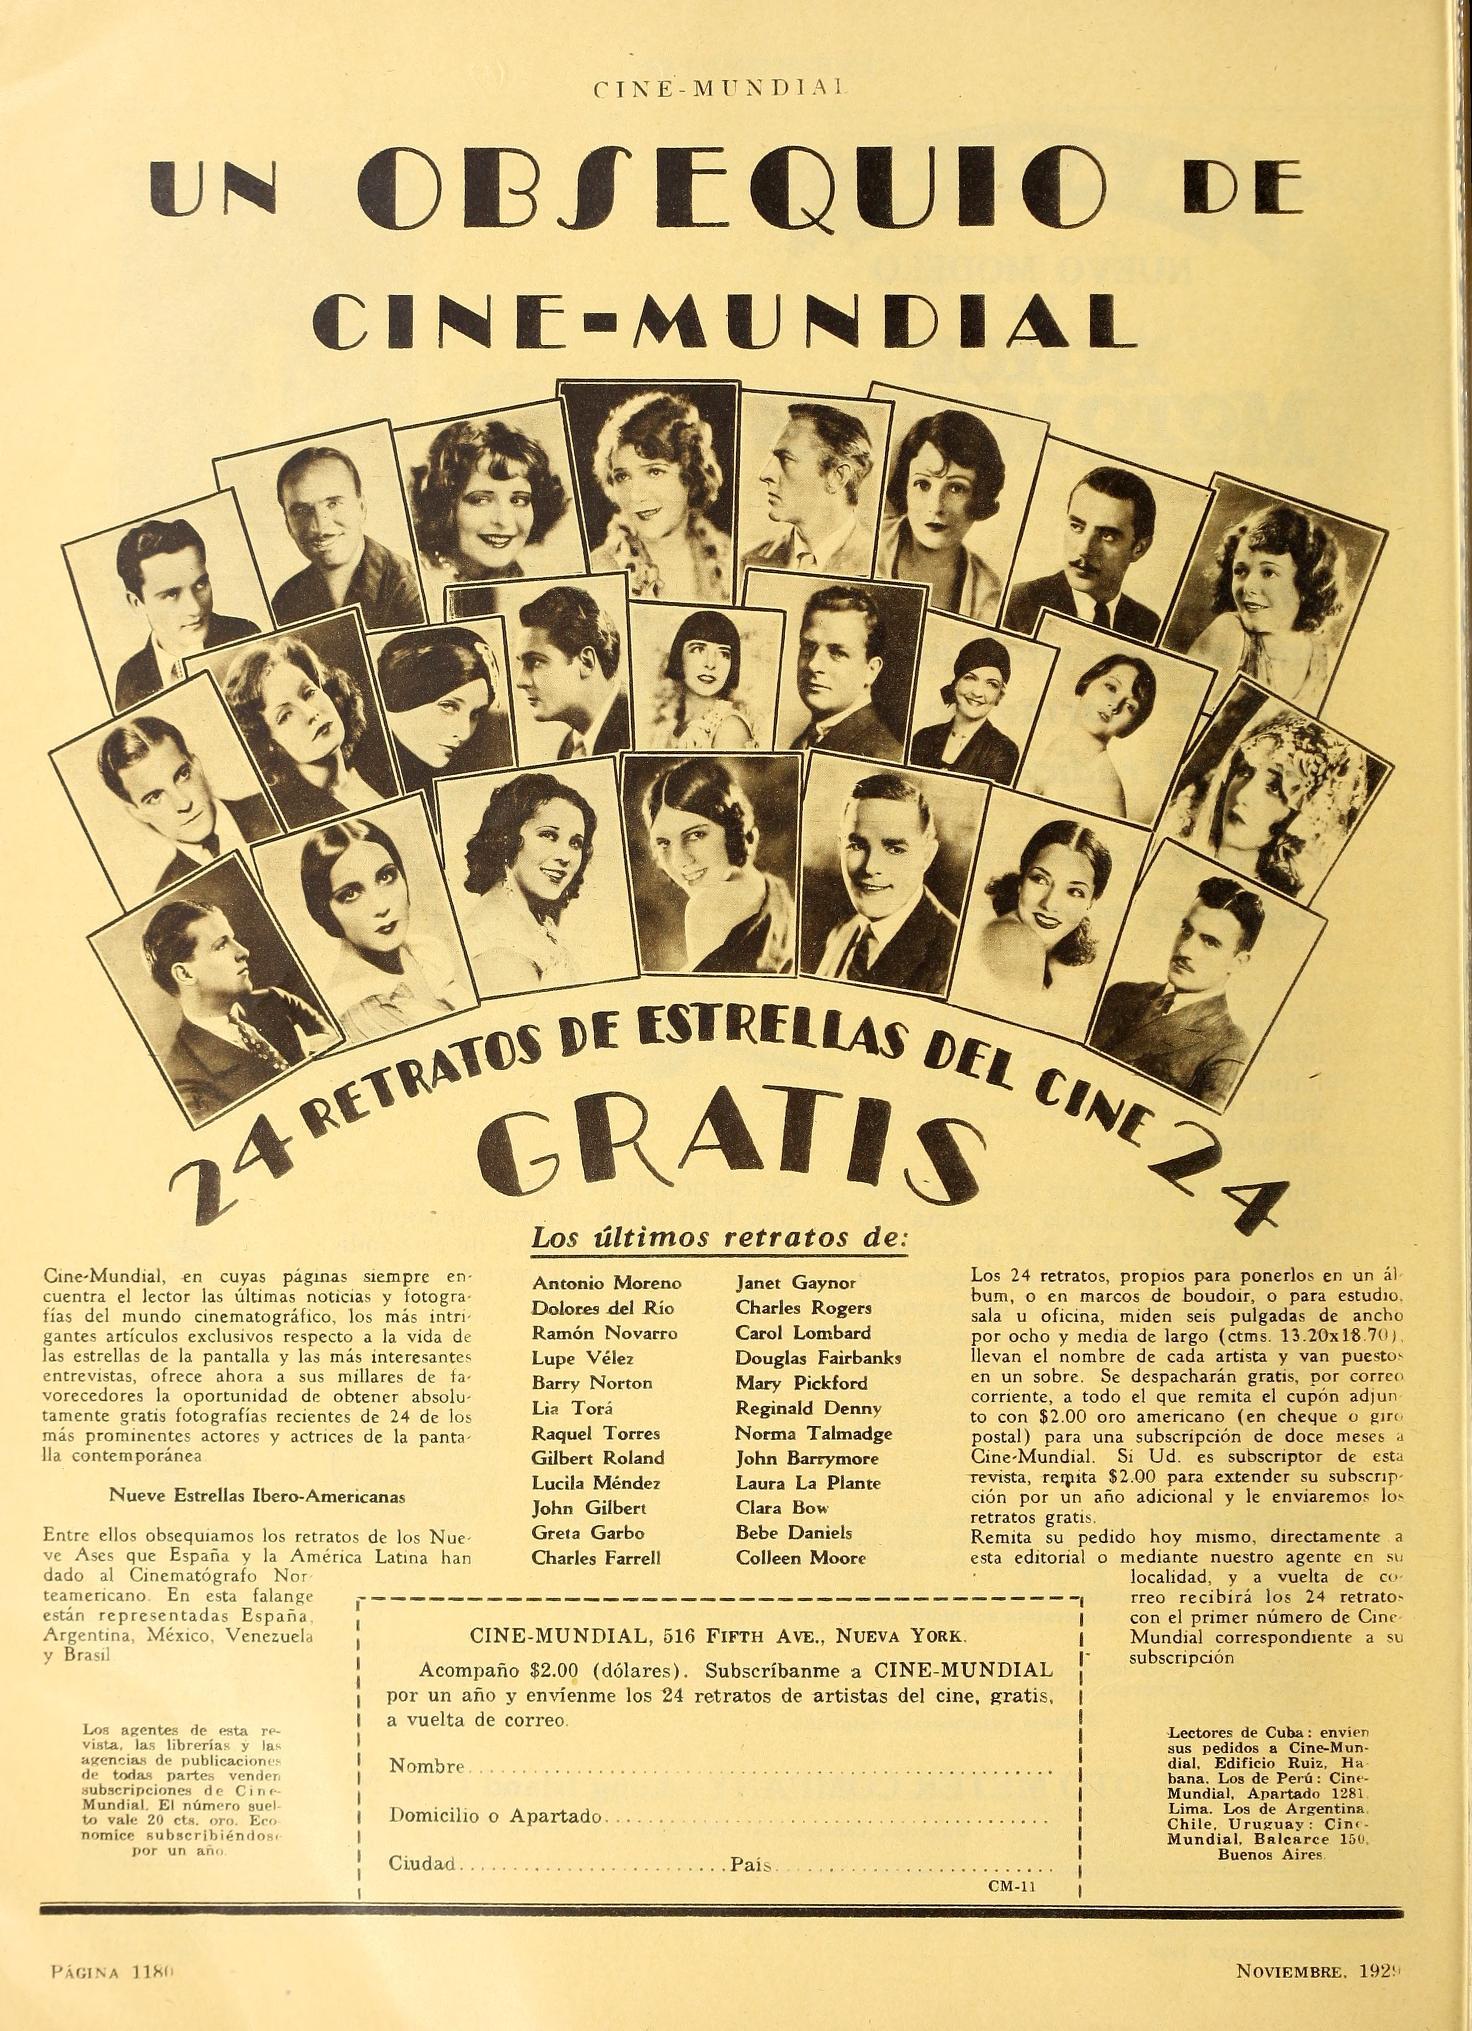 carole lombard cine mundial november 1929a